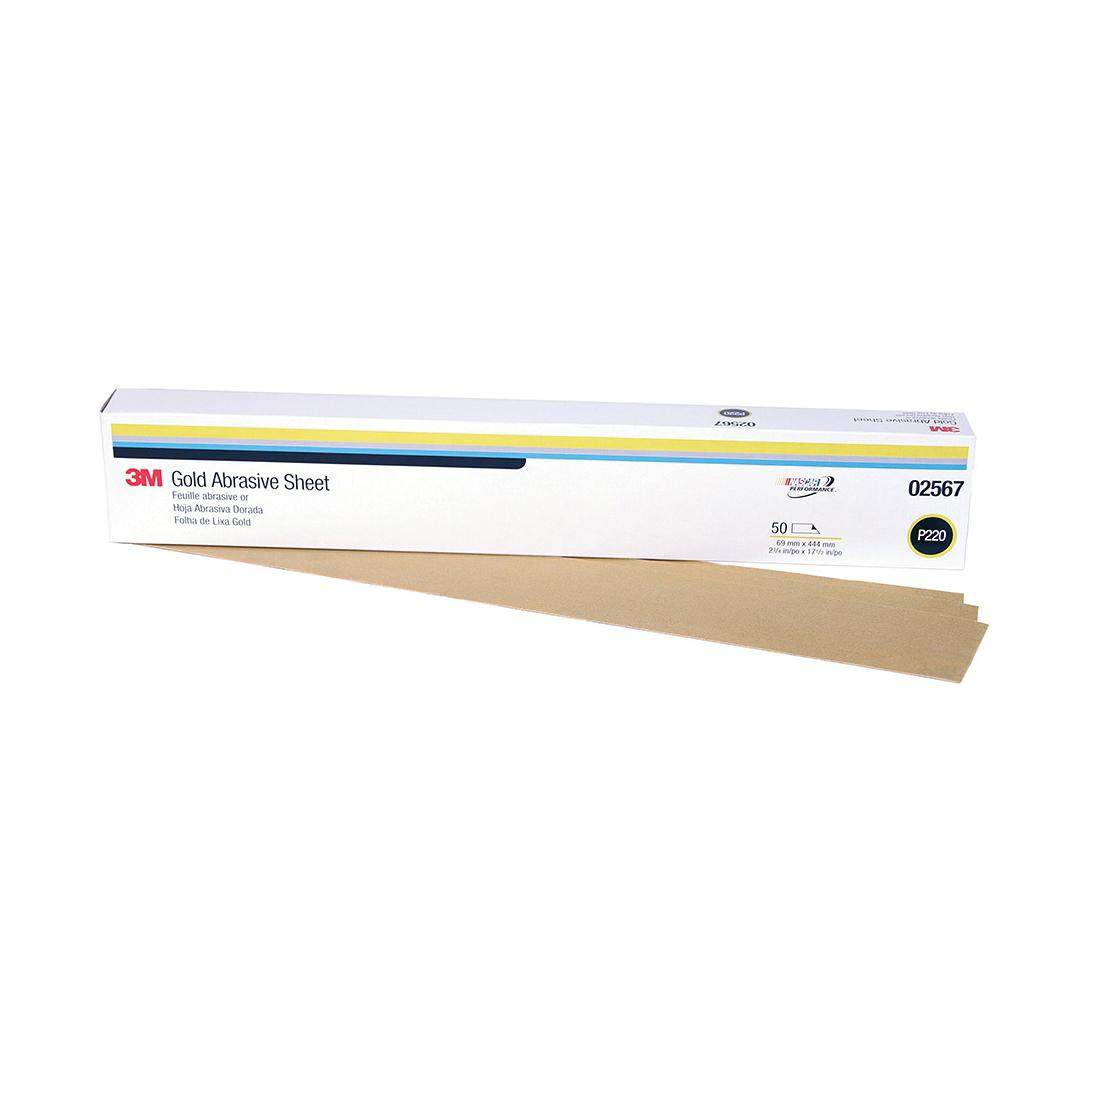 3M™ Production™ Resinite™ 051131-02567 216U Clip-On Coated Sanding Sheet, 16-1/2 in L x 2-3/4 in W, P220 Grit, Coarse Grade, Aluminum Oxide Abrasive, Paper Backing